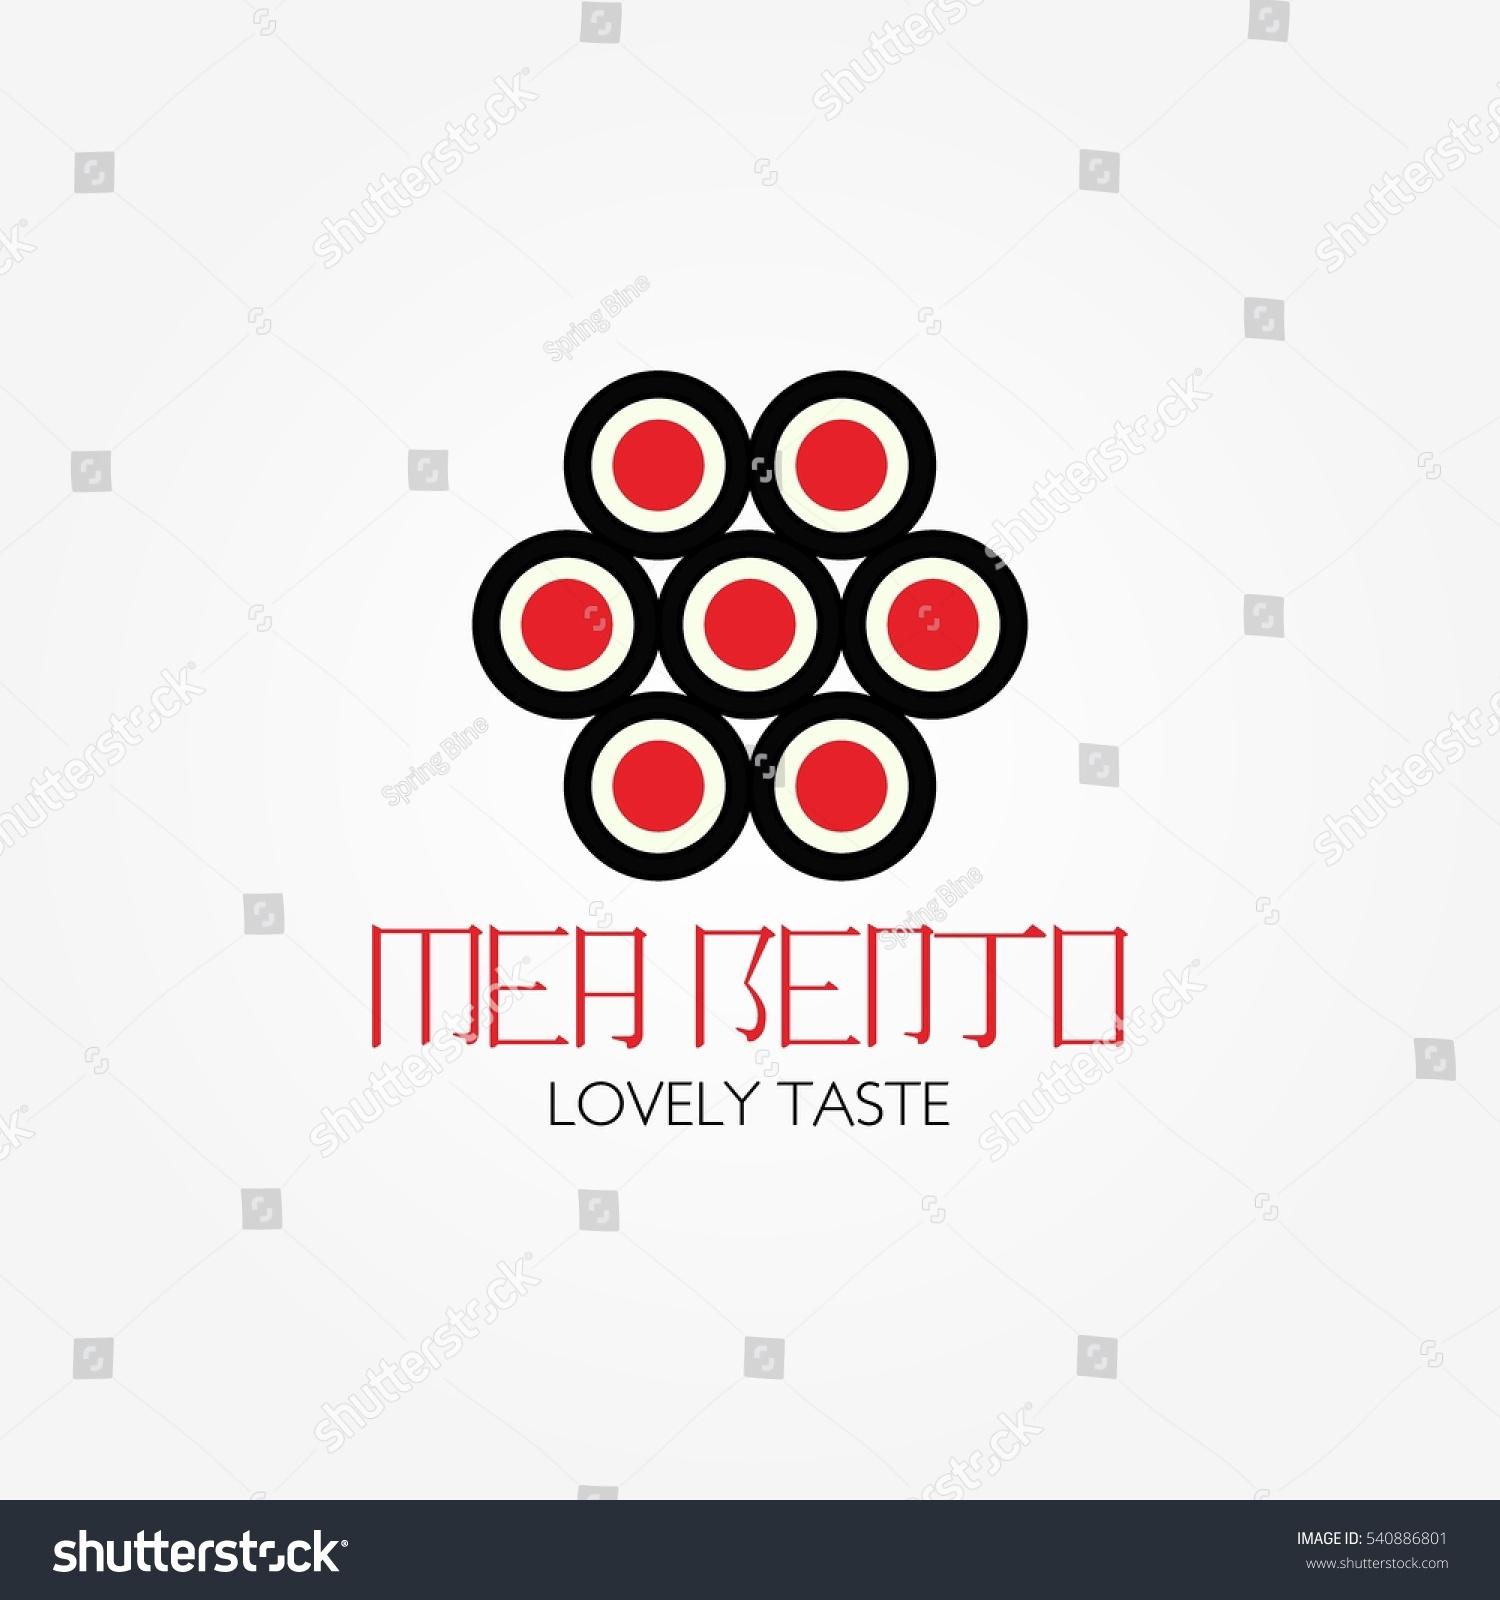 Vector De Stock Libre De Regalias Sobre Traditional Japanese Food Restaurant Logo Design540886801